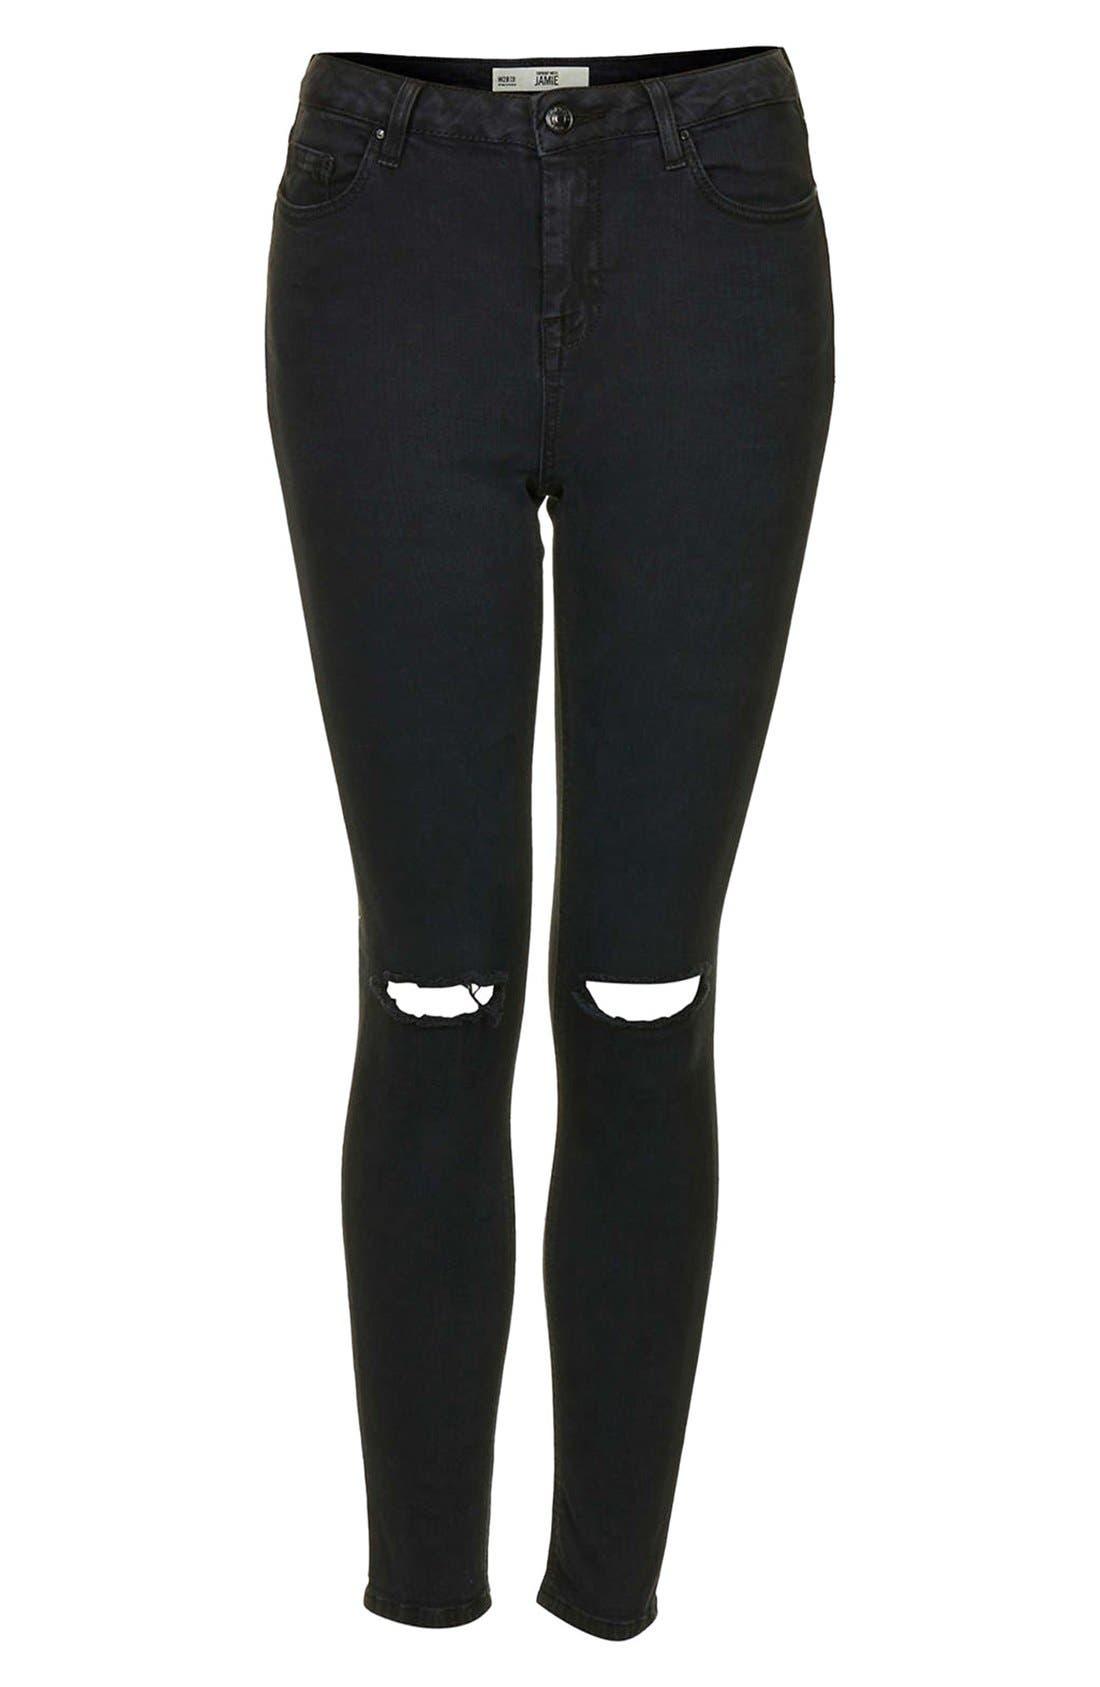 Alternate Image 3  - Topshop Moto 'Jamie' Dark Wash Ripped Slim Jeans (Black) (Short & Regular)